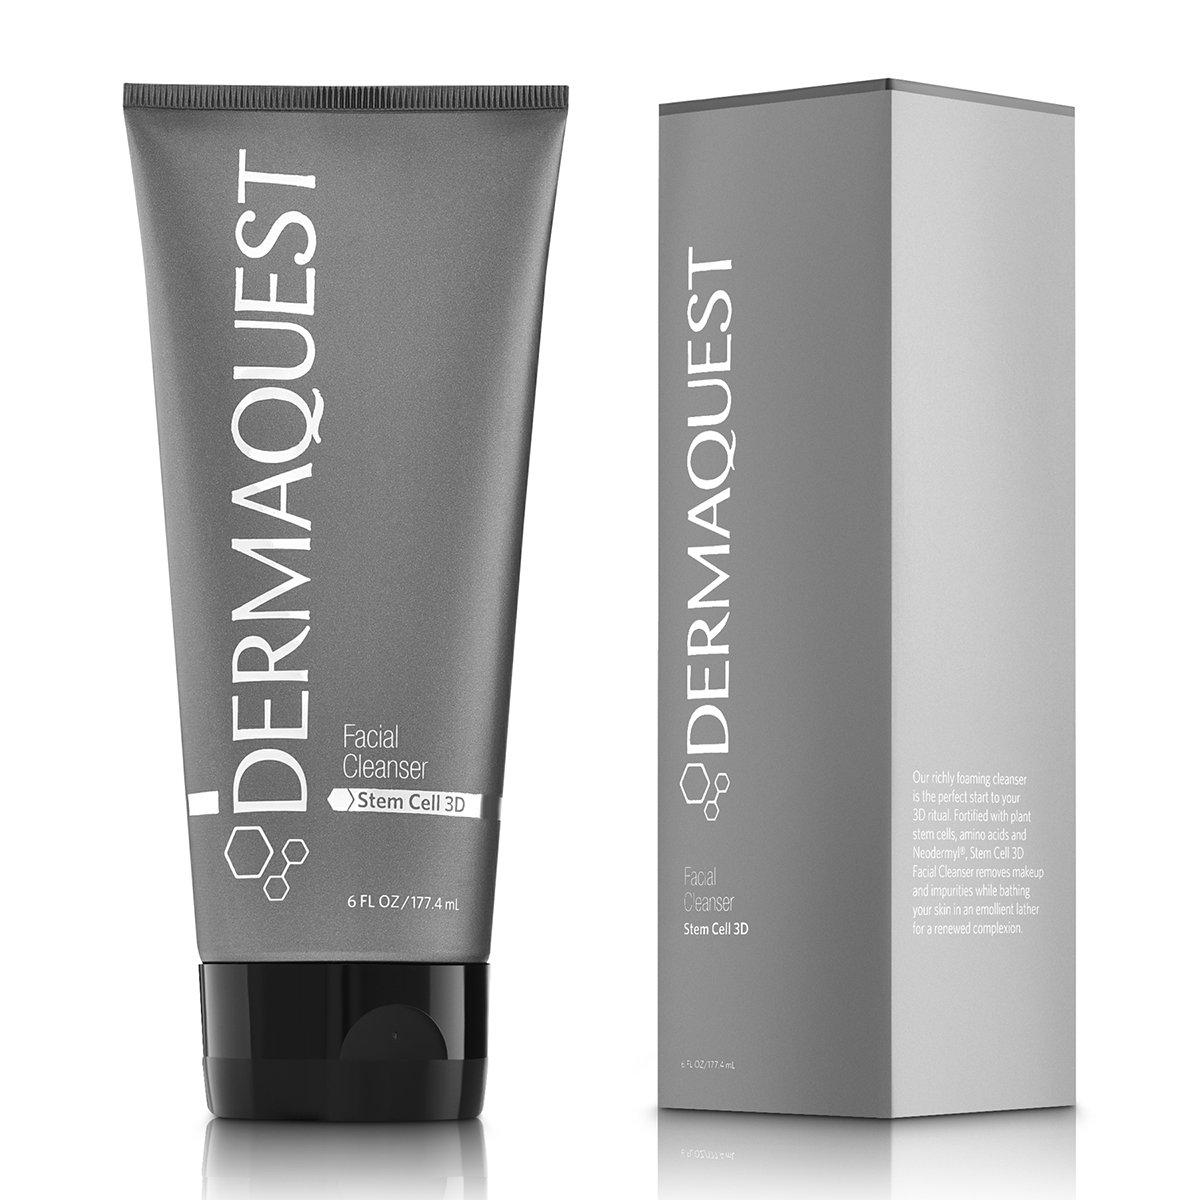 DermaQuest Stem Cell B00KY8WBSC 3D DermaQuest Facial Cleanser 177.4ml/6oz並行輸入品 Cell B00KY8WBSC, リサイクルマート:5bbdb9c4 --- ijpba.info